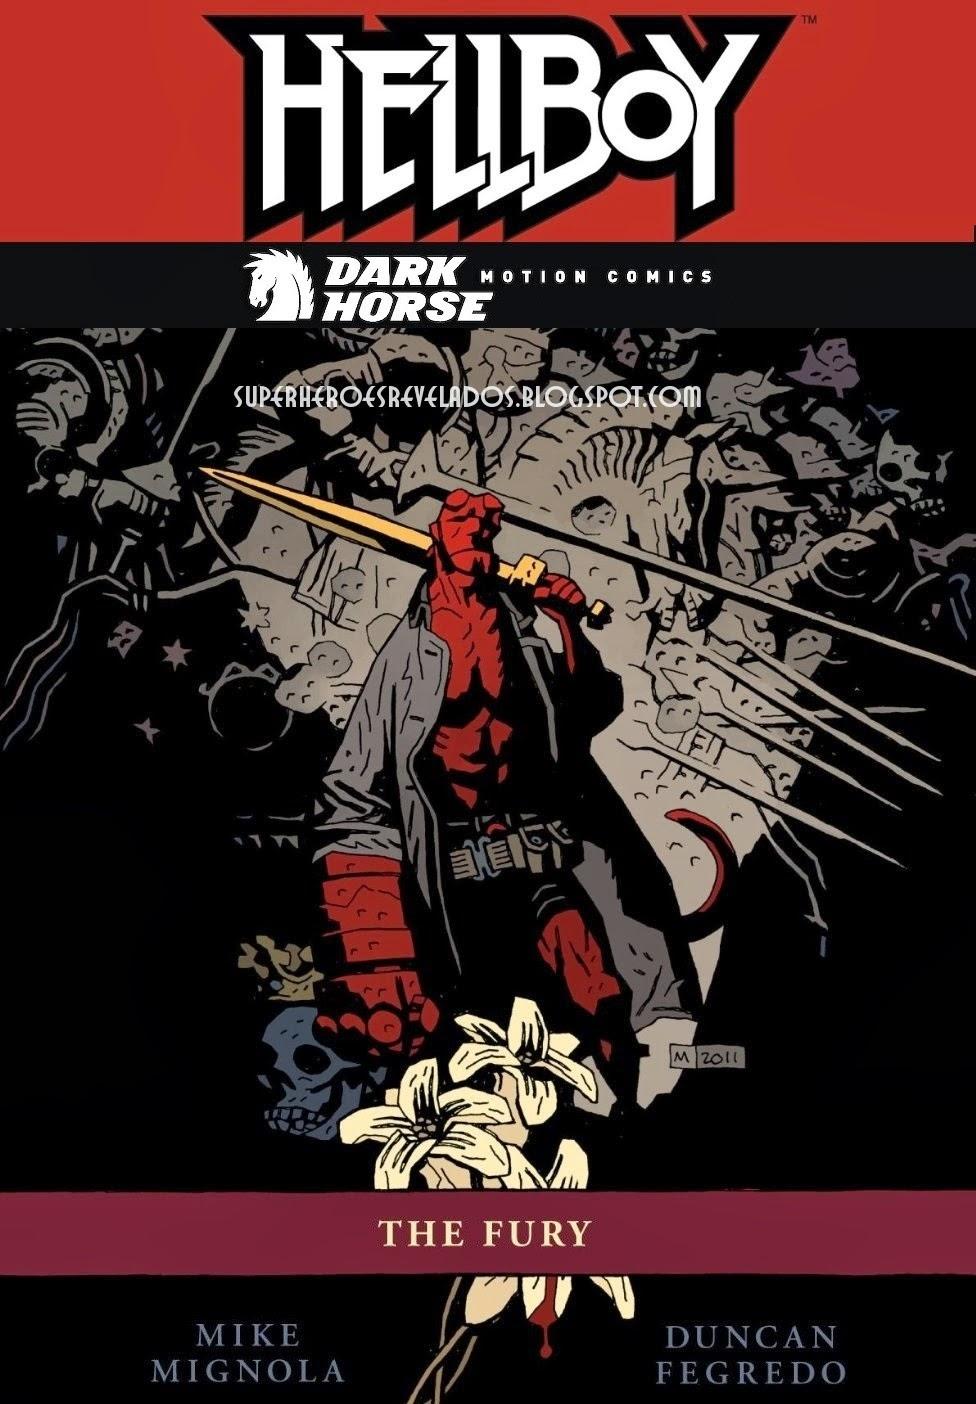 http://superheroesrevelados.blogspot.com.ar/2014/01/hellboy-motion-comics.html